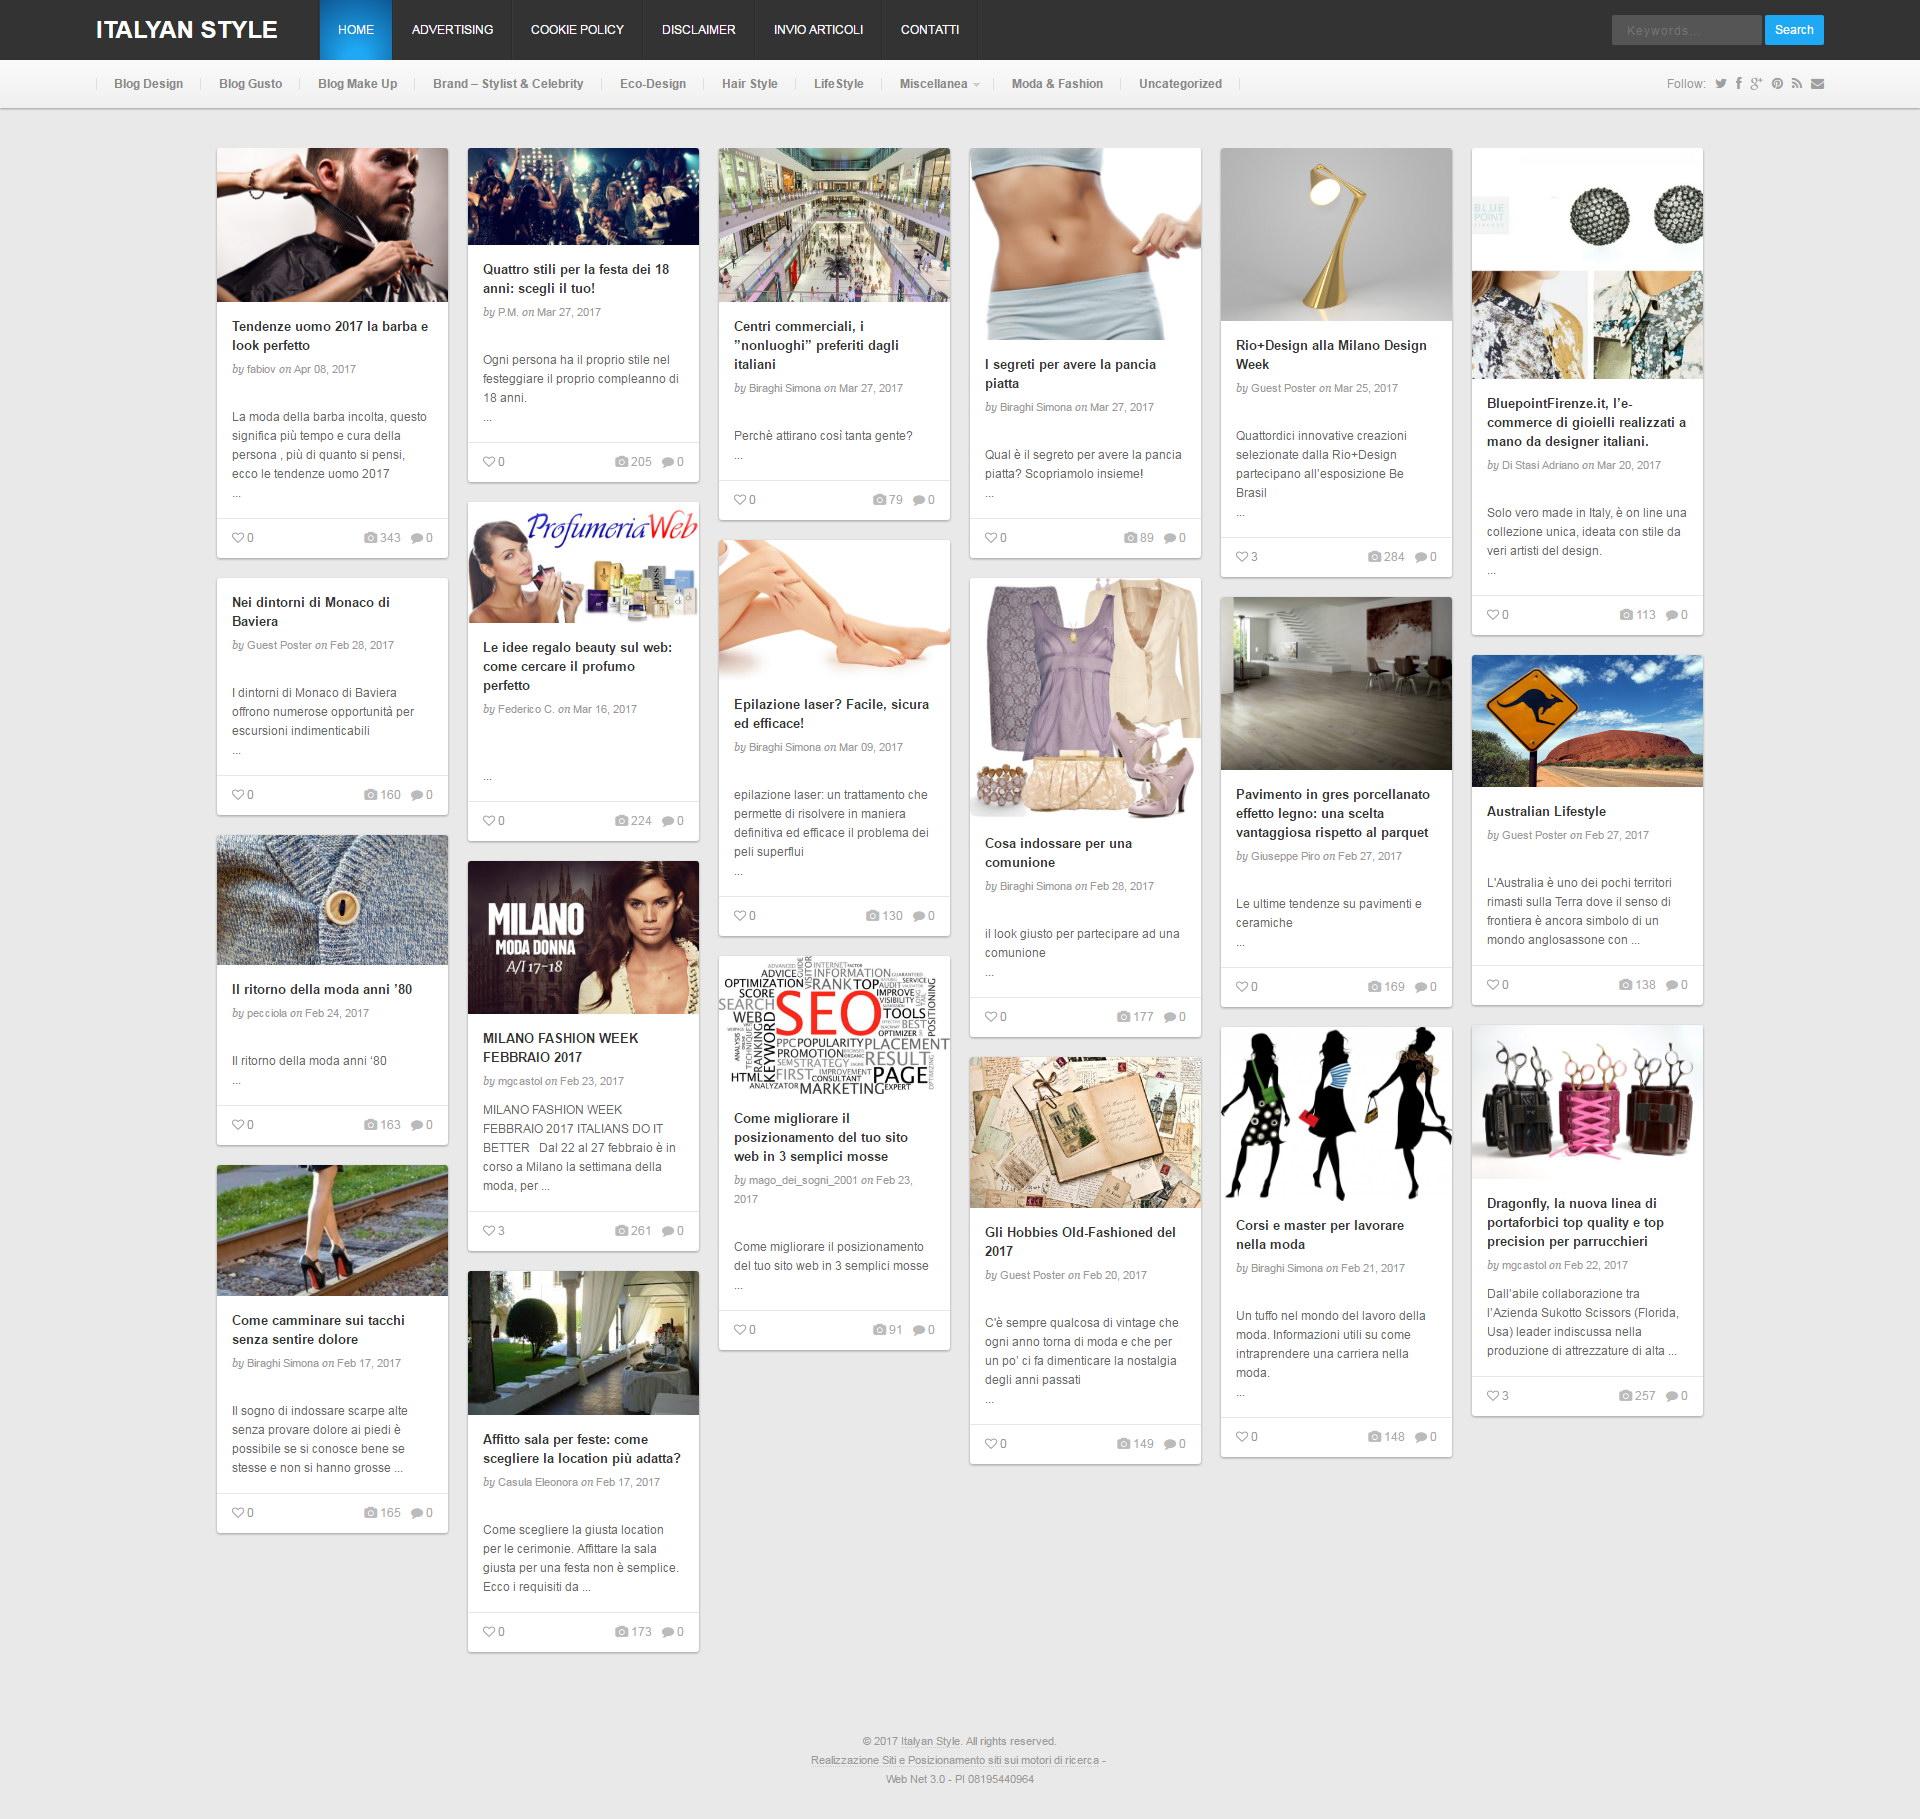 ItalyanStyle.com: lifestyle, fashion, design